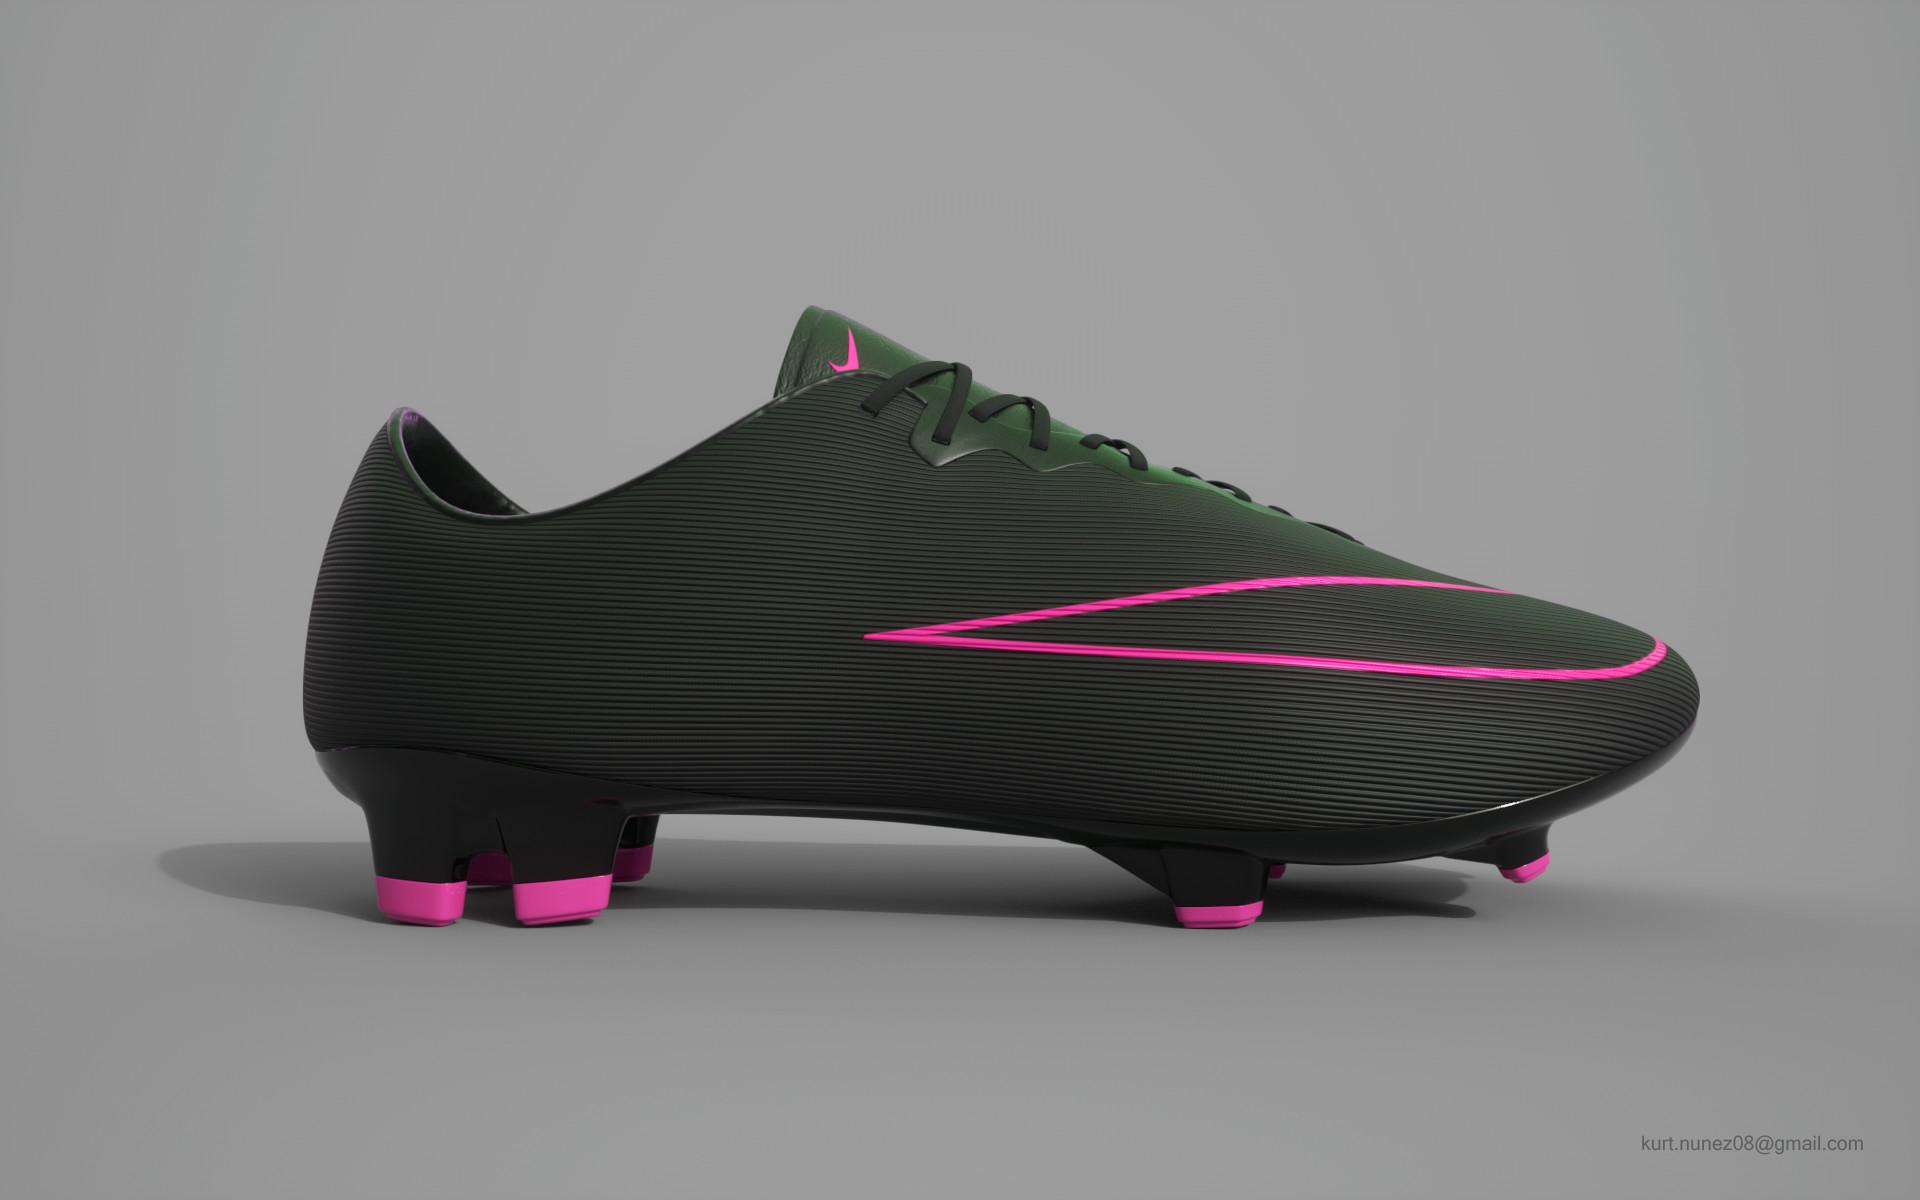 best website 732af 23530 Kurt Nuñez - Mecurial Vapor X 2016 | Nike Shoe